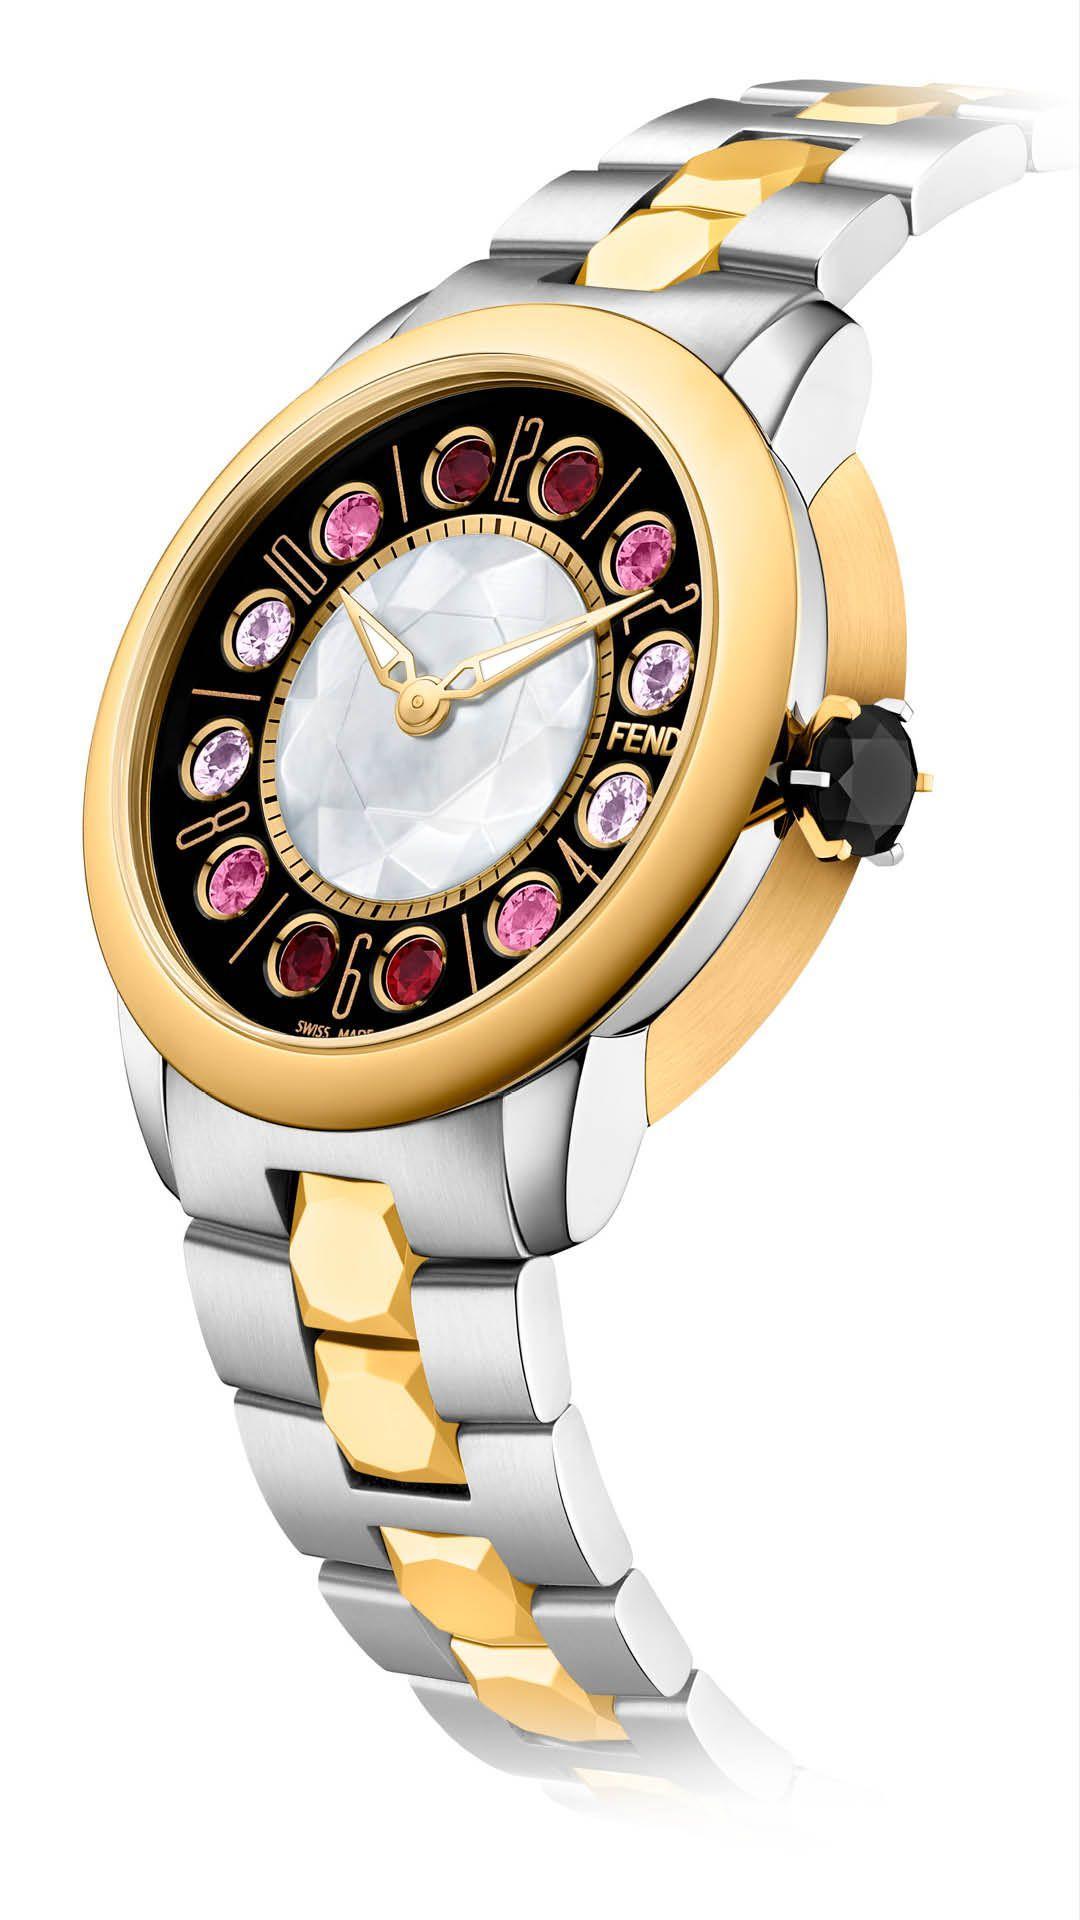 New FENDI IShine Timepiece